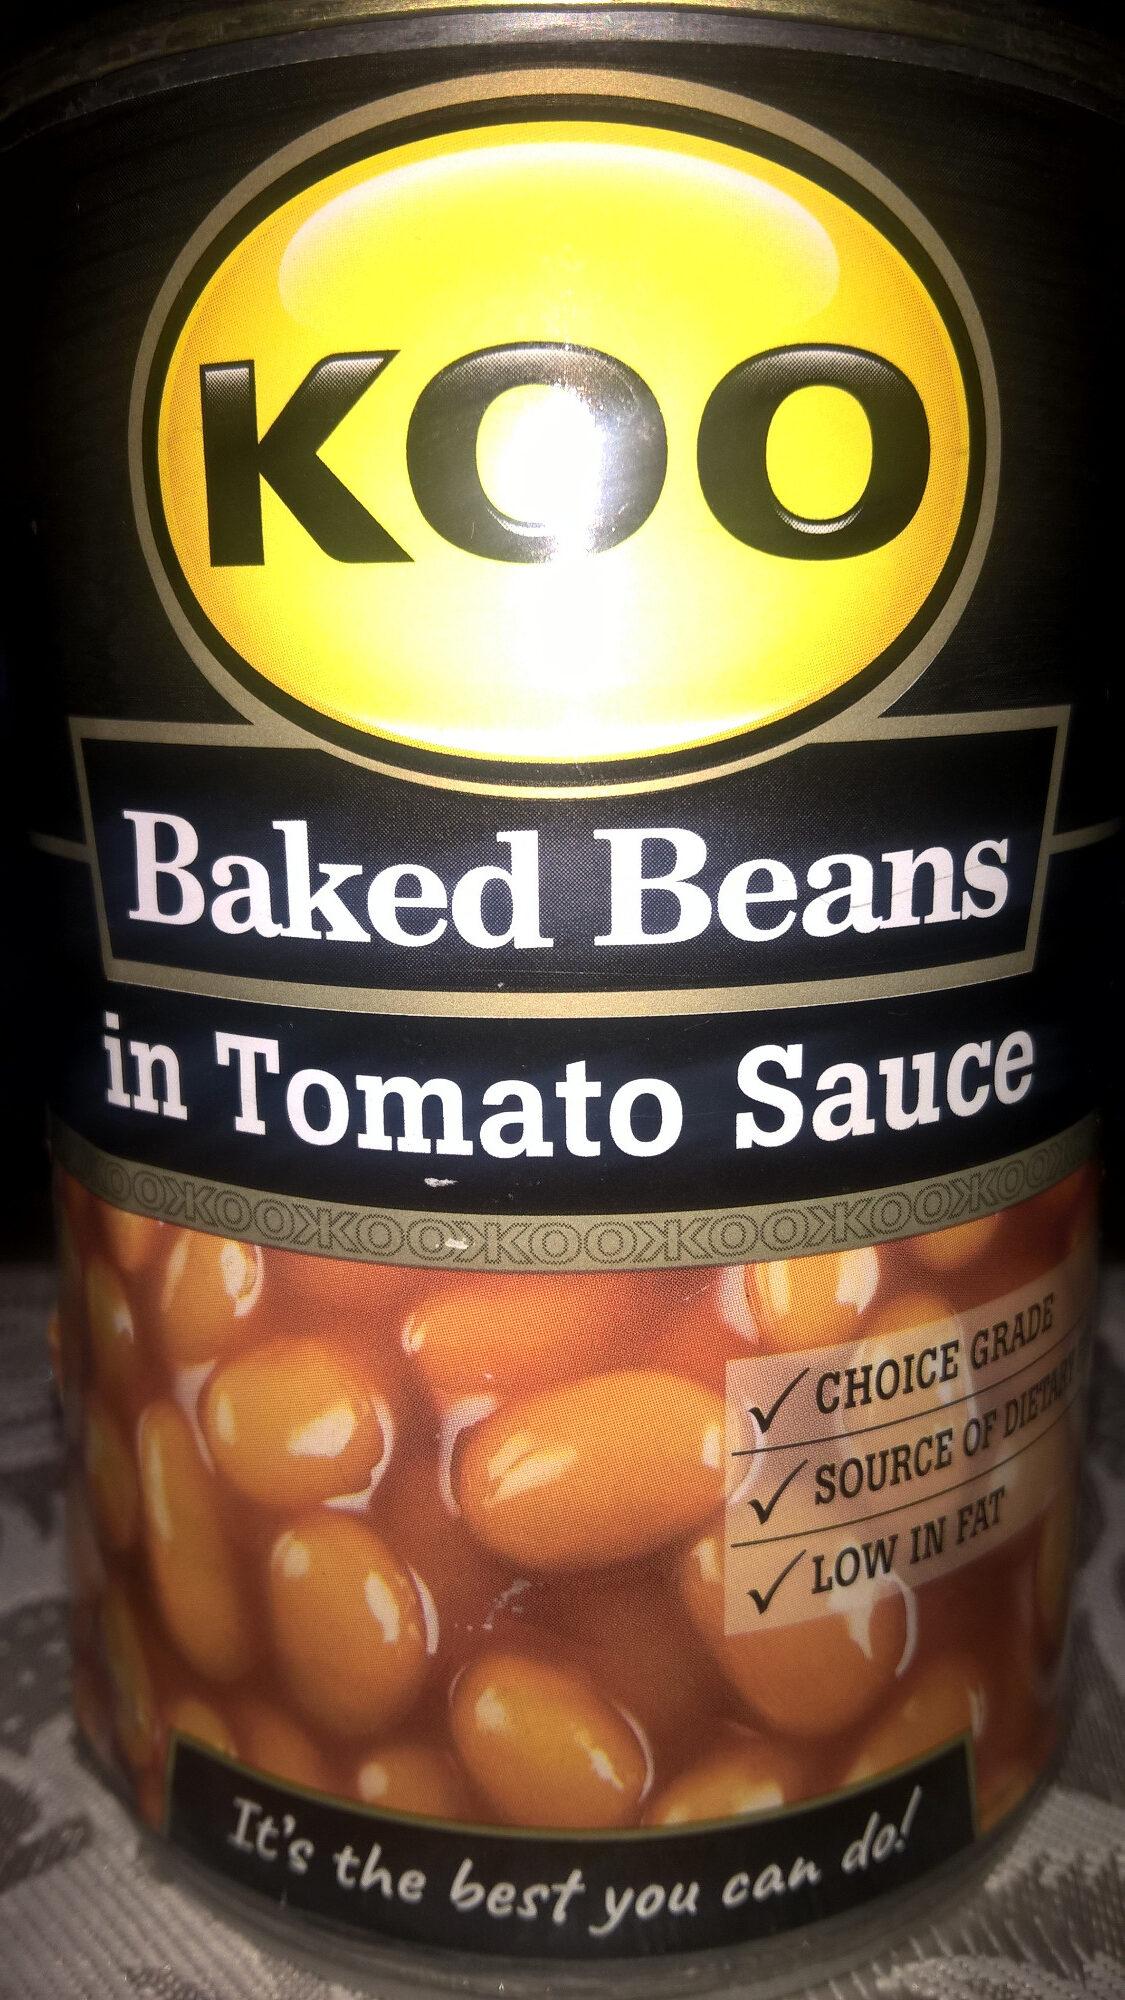 KOO Baked Beans in Tomato Sauce - Product - en